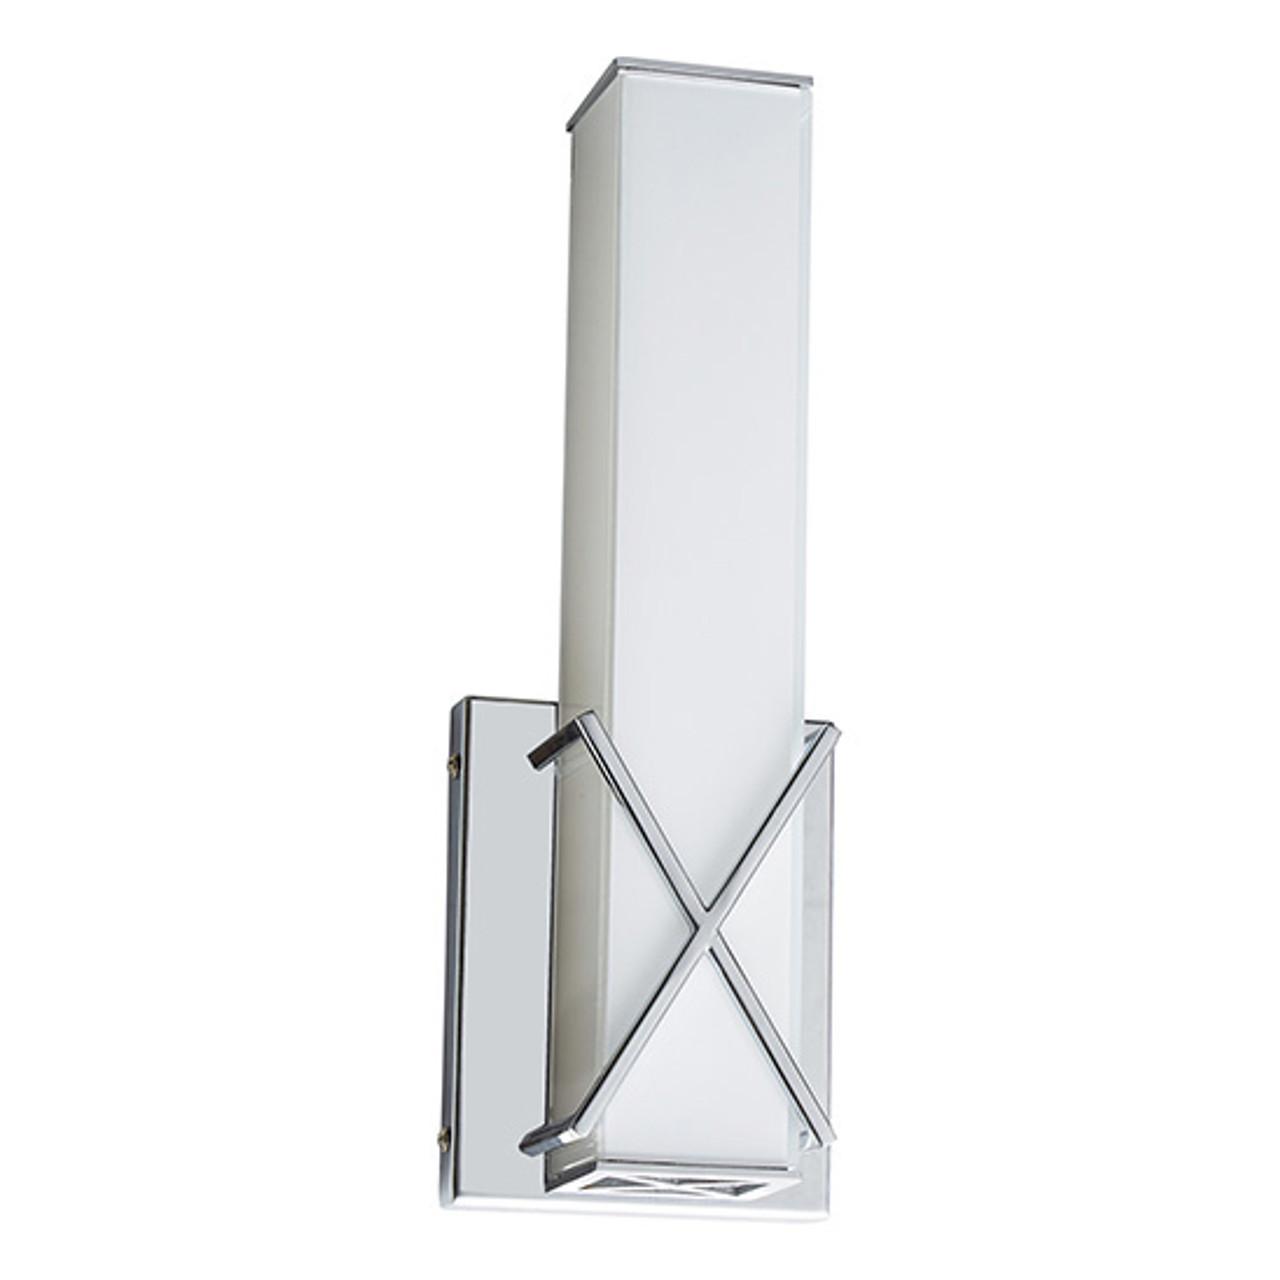 Chrome Vanity Light, WS412 – 14W - 5000K